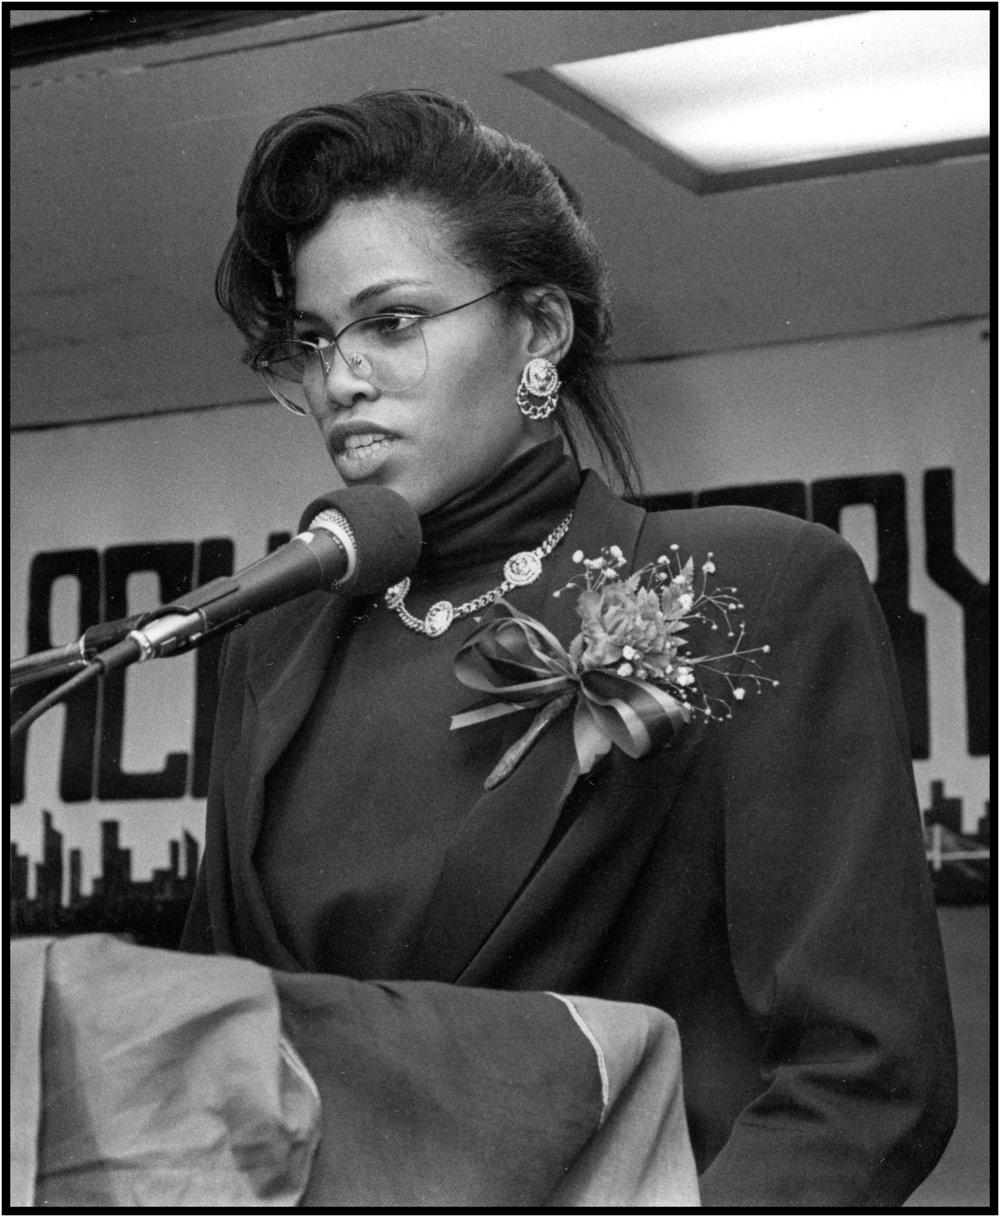 Milikah Shabbaz (Malcolm X's daughter), 1989.